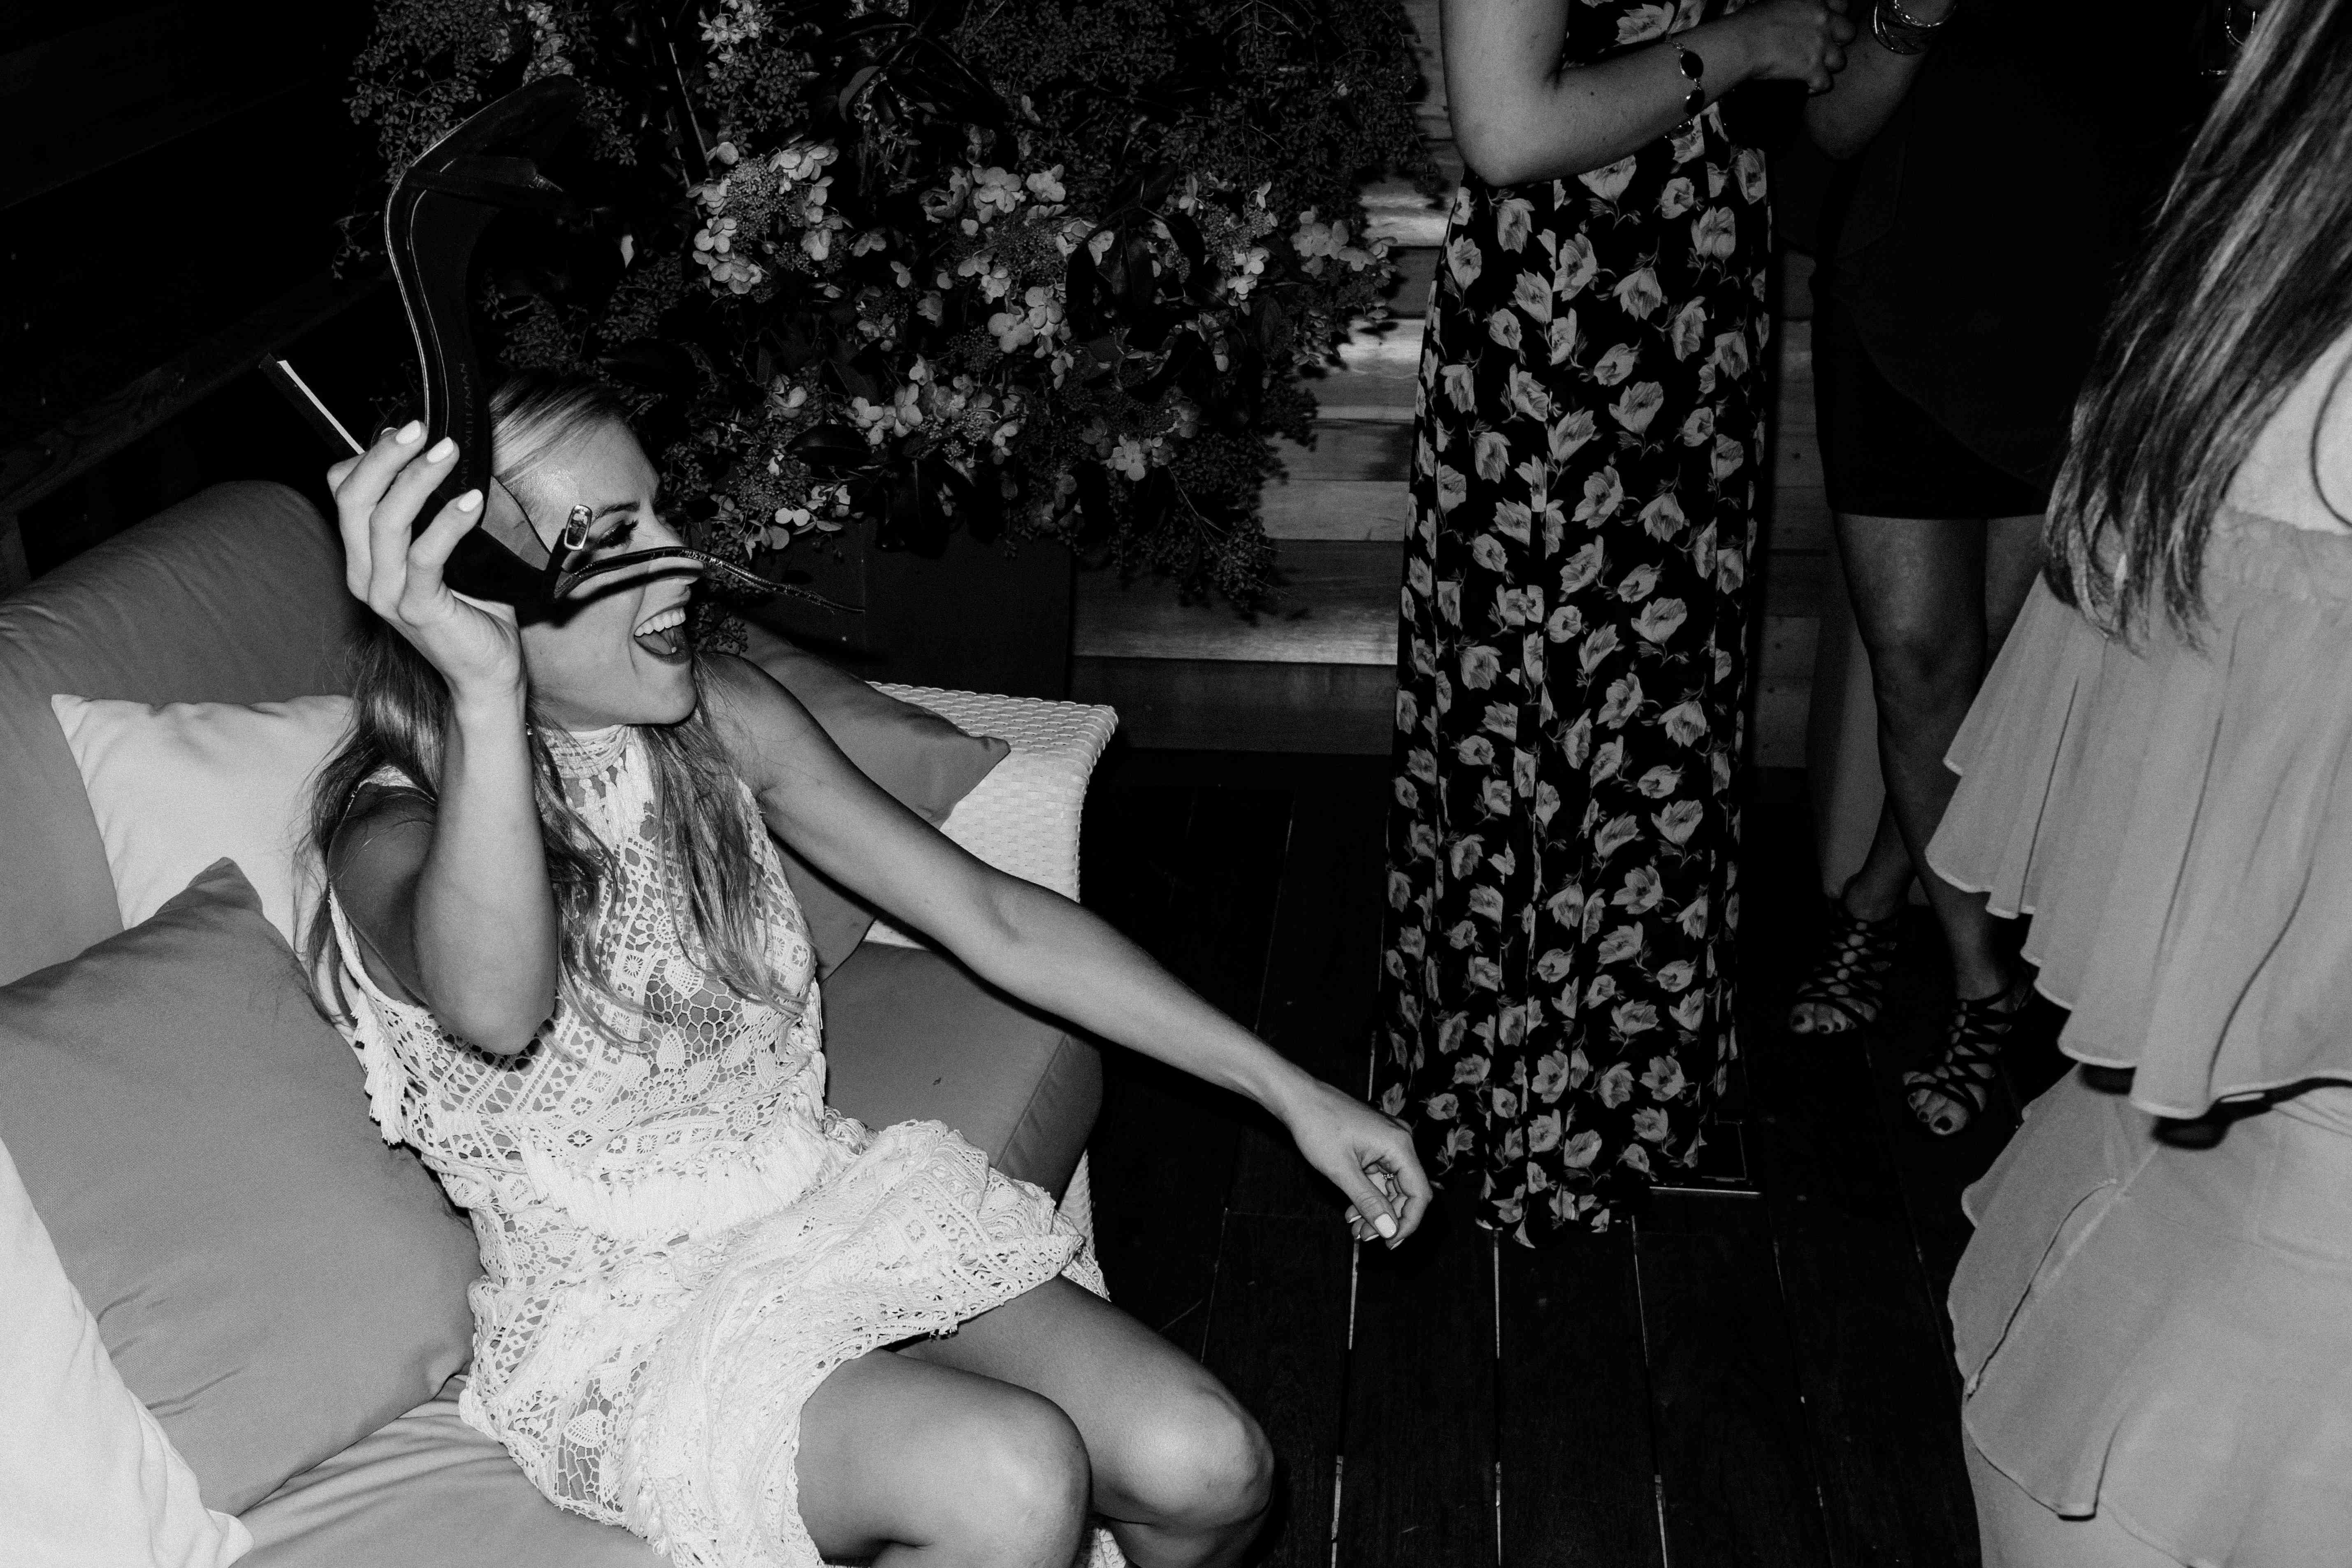 Bride holding shoe dancing